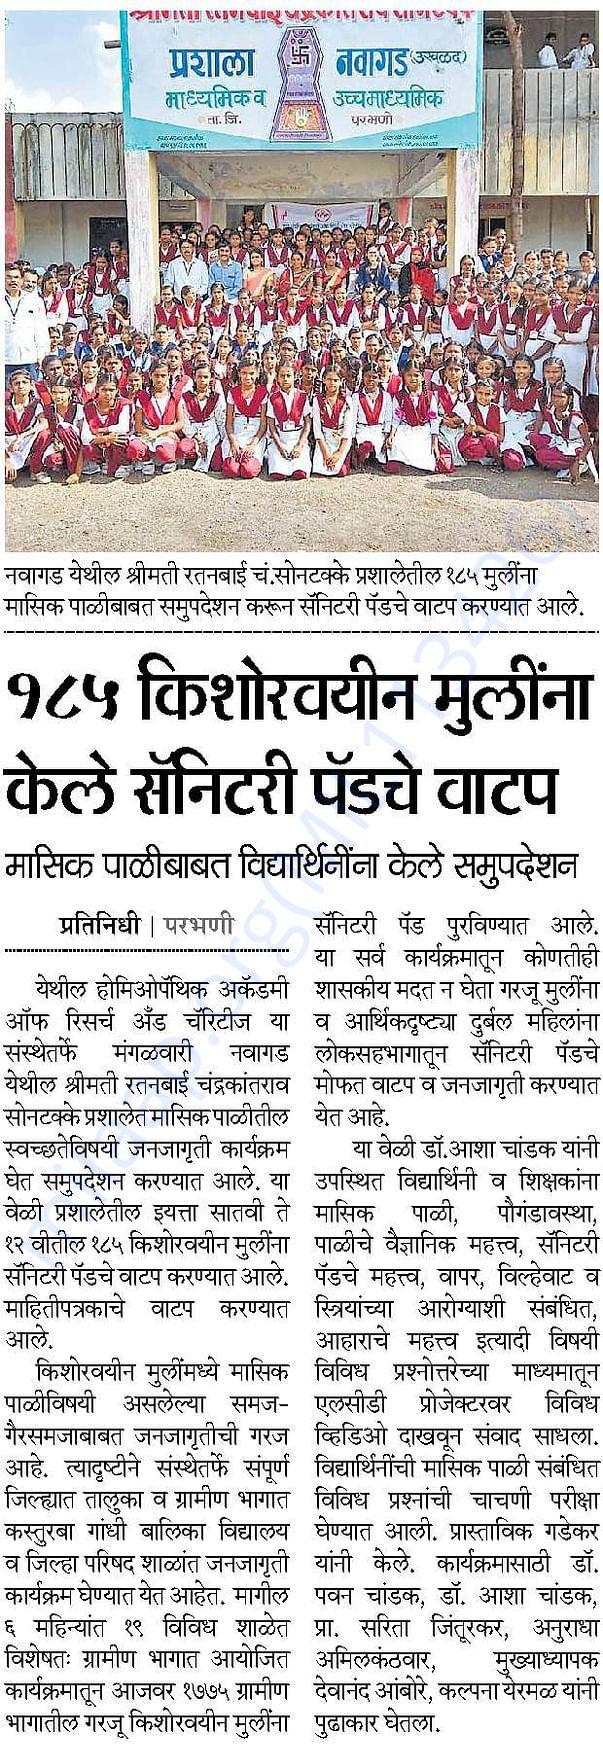 Menstrual Hygiene & Management Program at Navagad - Sakal newspaper